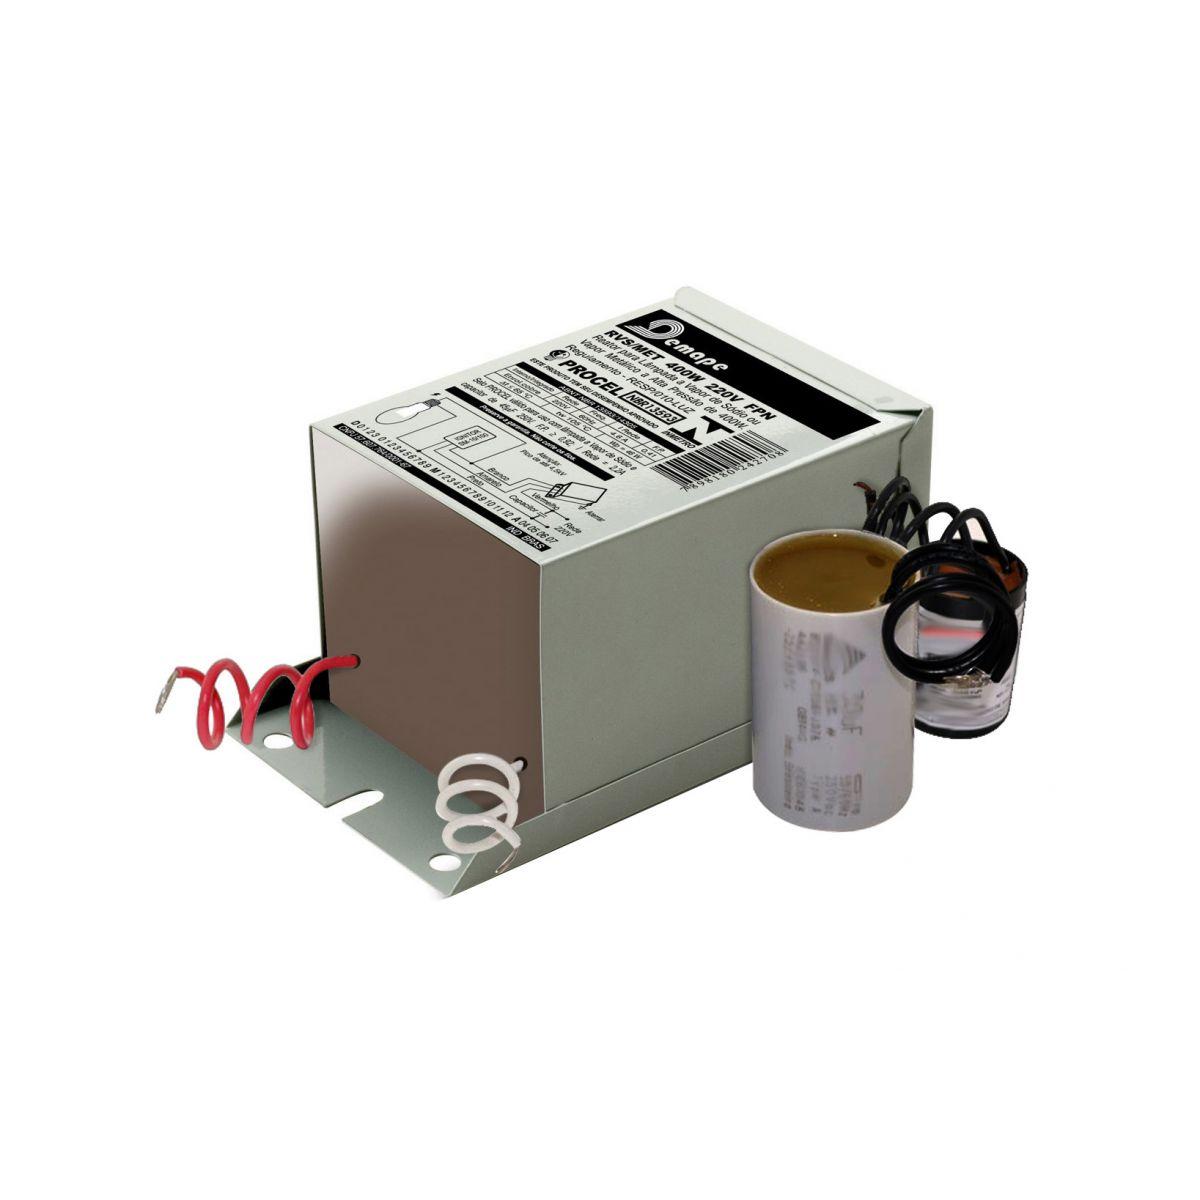 Reator  600W Vapor Sódio - Uso Interno - 220V